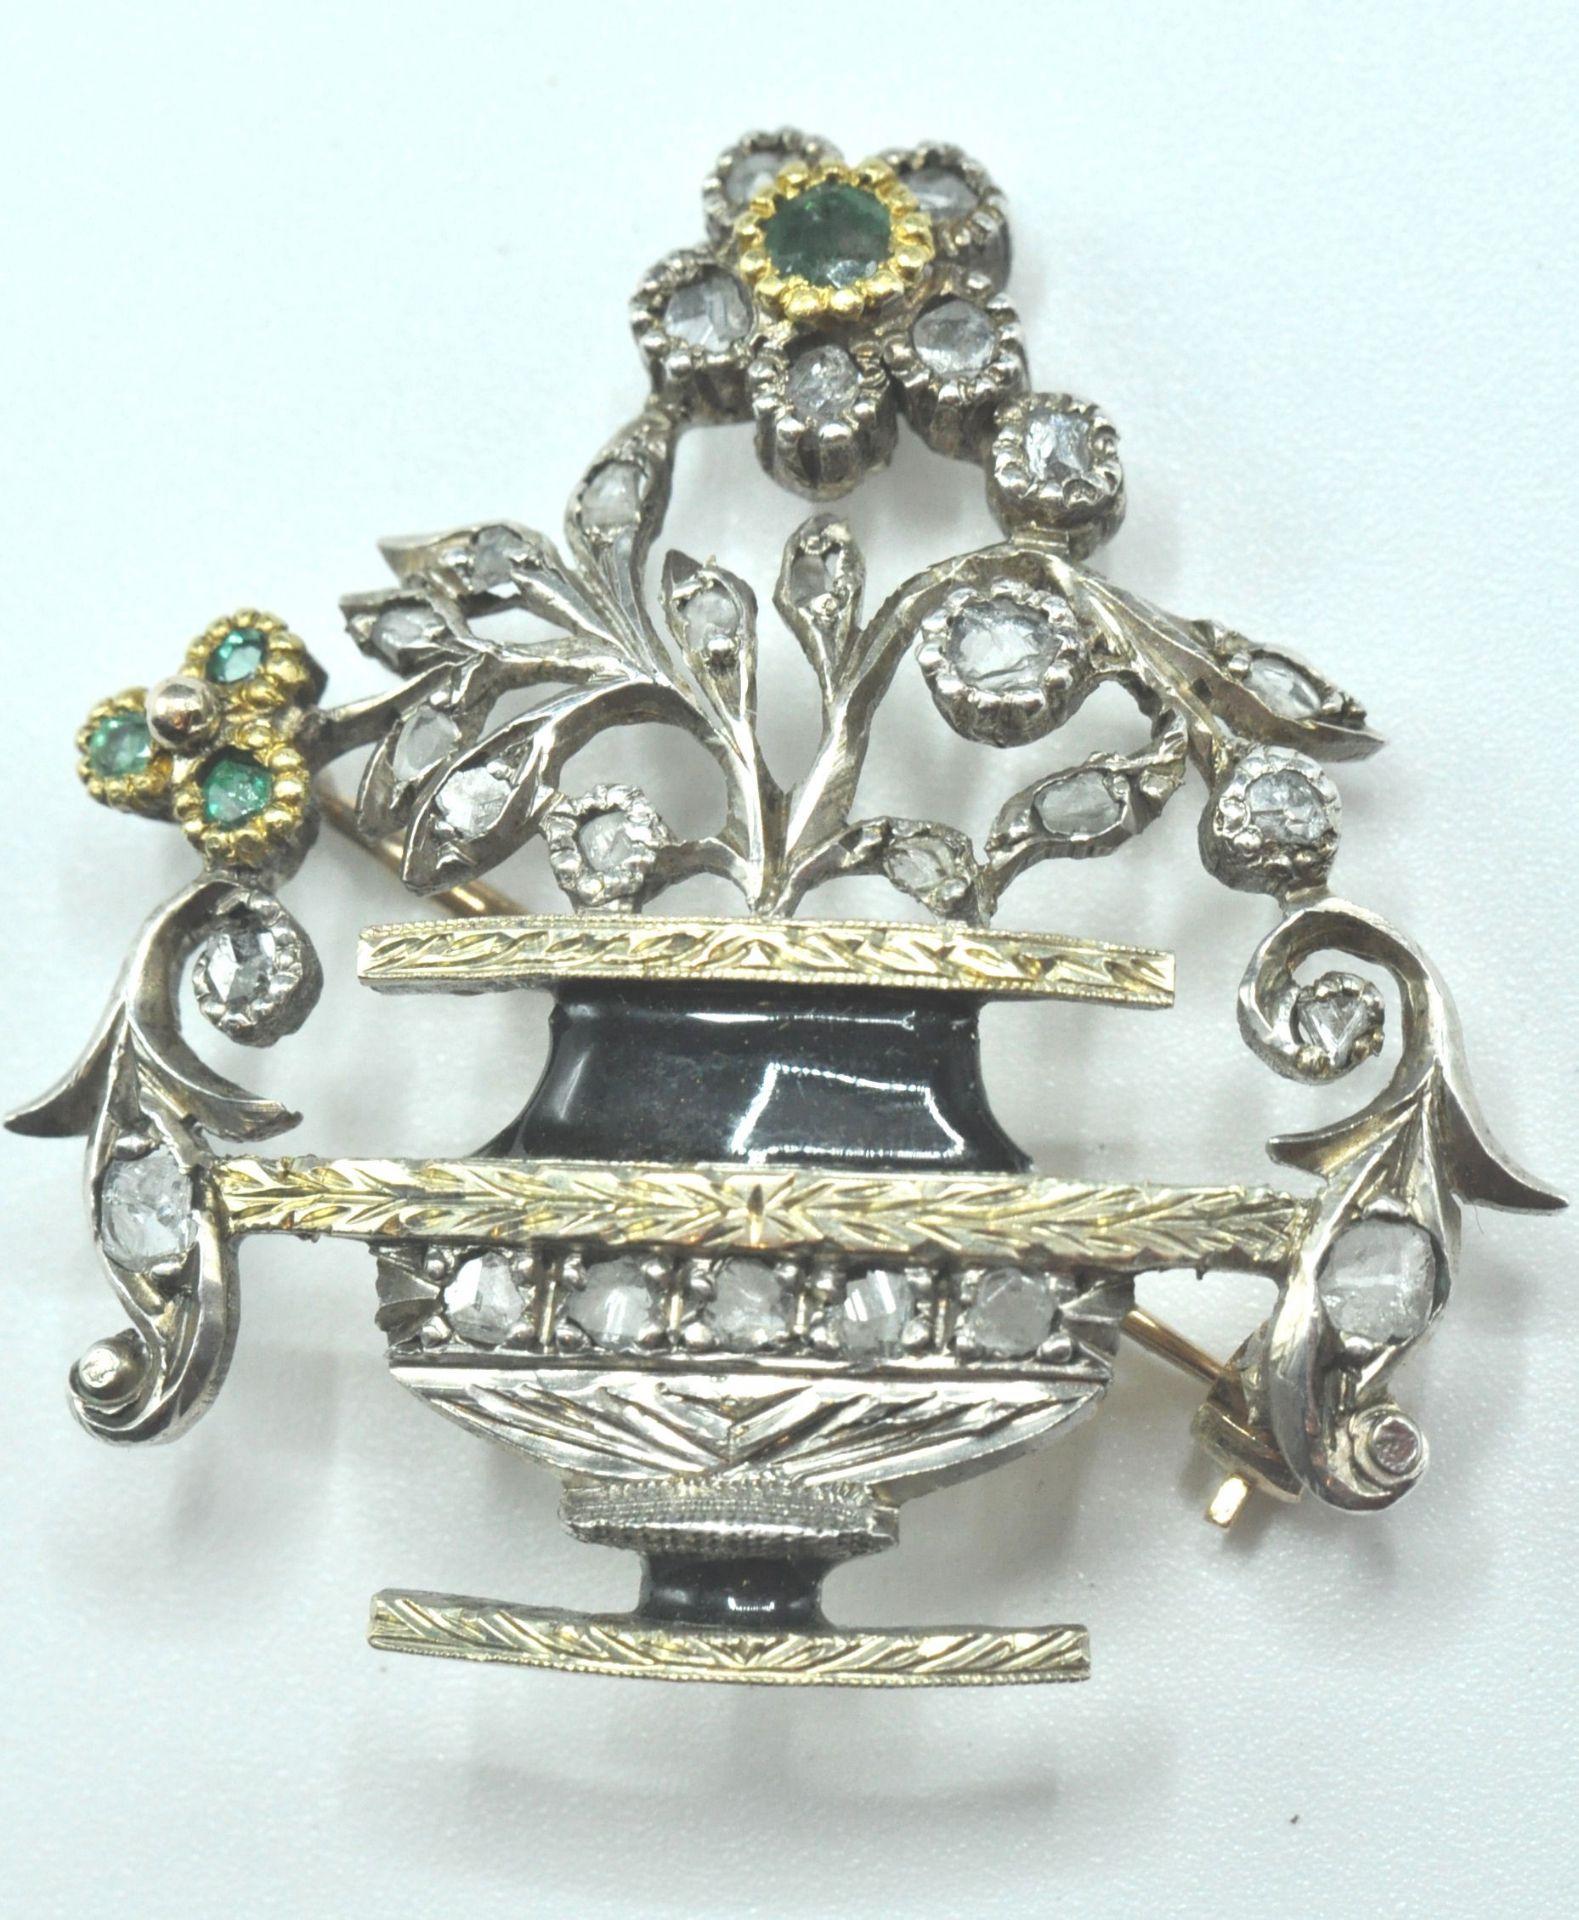 18ct White & Yellow Gold Emerald & Diamond Jardiniere Brooch